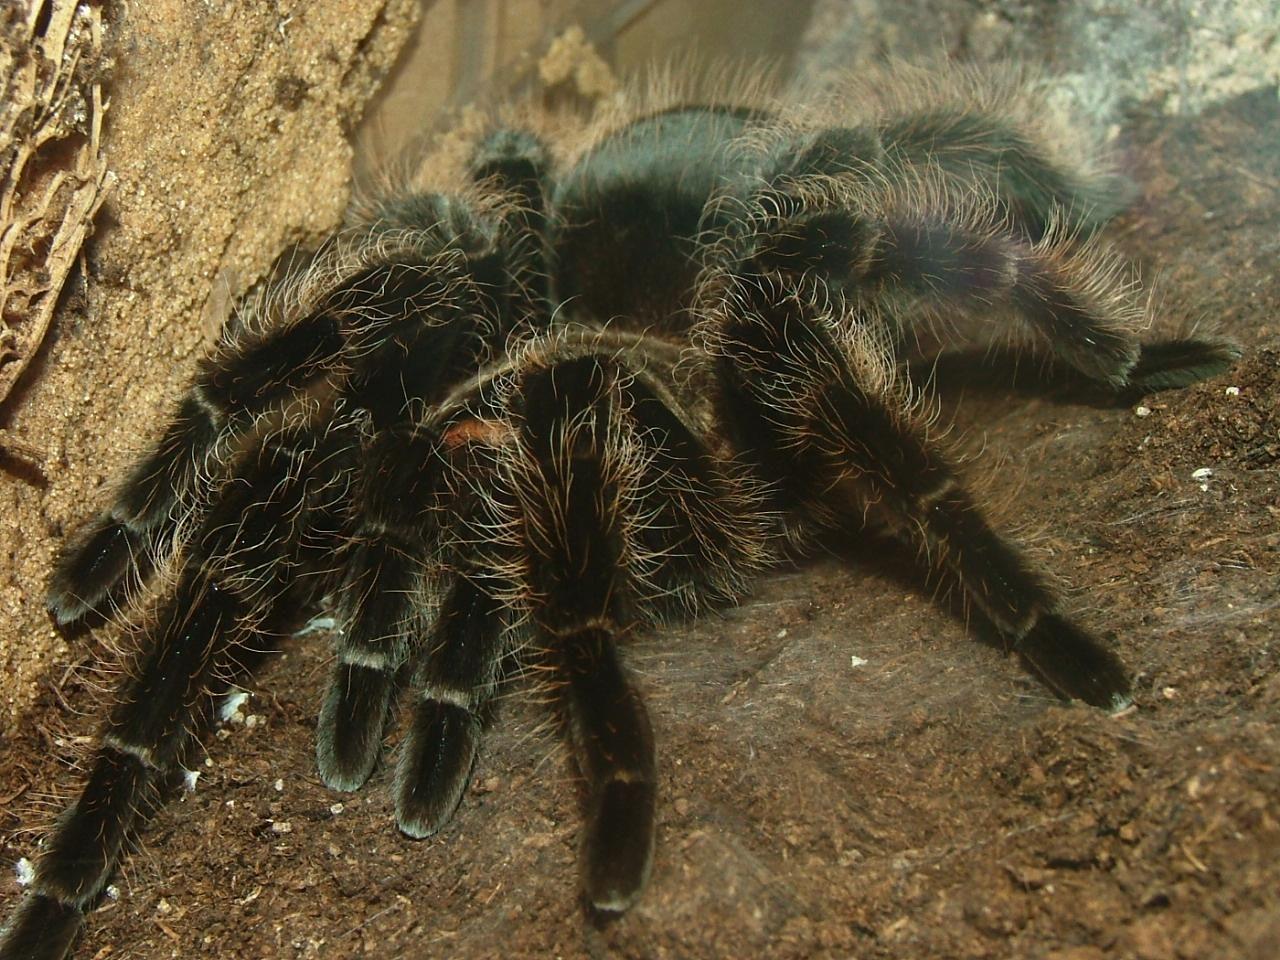 Норы взрослых тарантулов